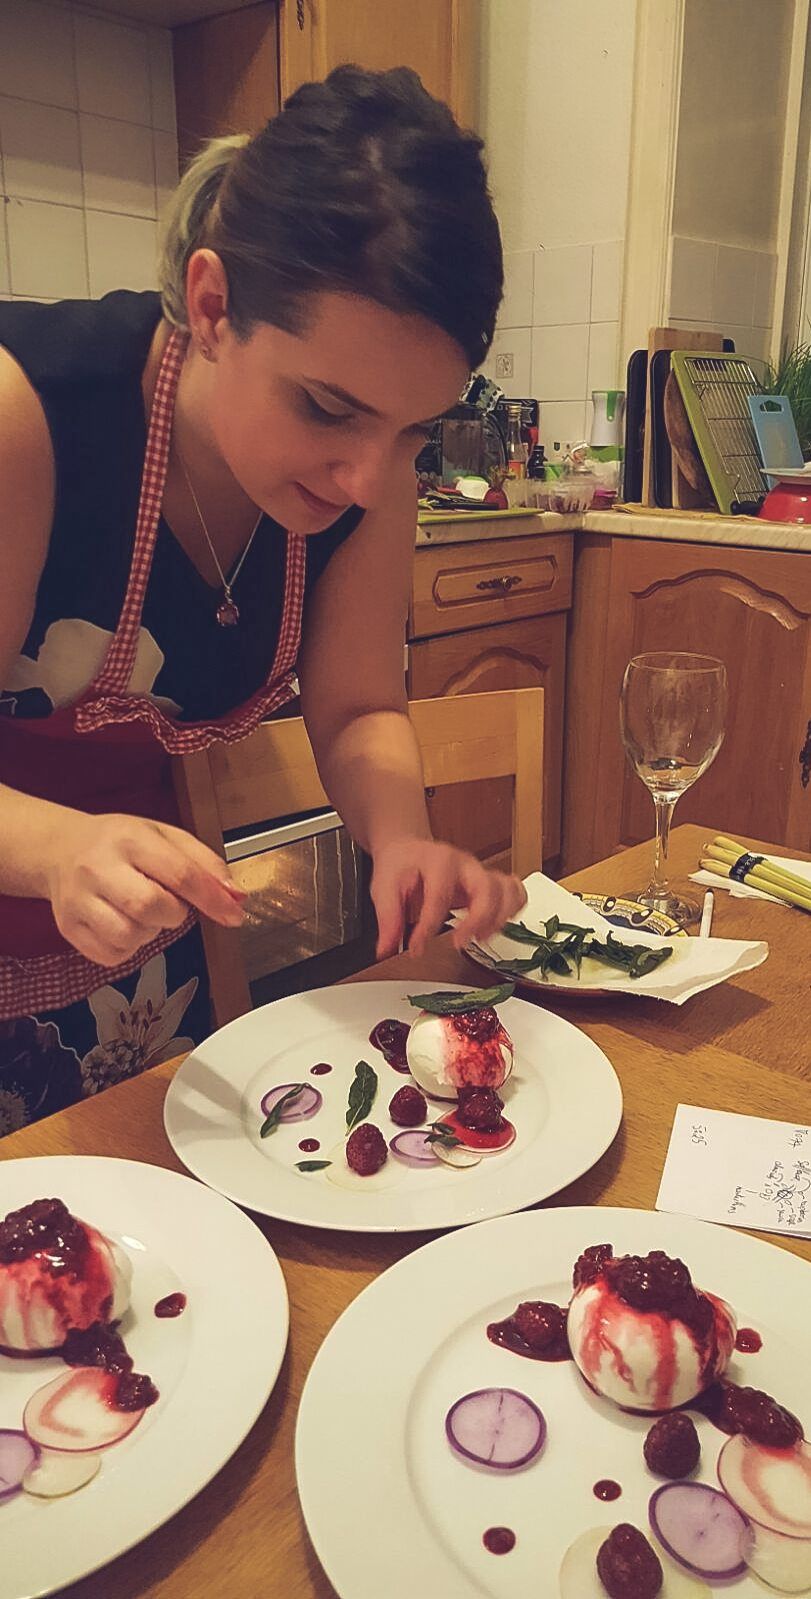 Mozzarella di Buffala with Raspberry Sauce, Crispy Sage, Almonds and Radishes (and a sneak peek into my kitchen)